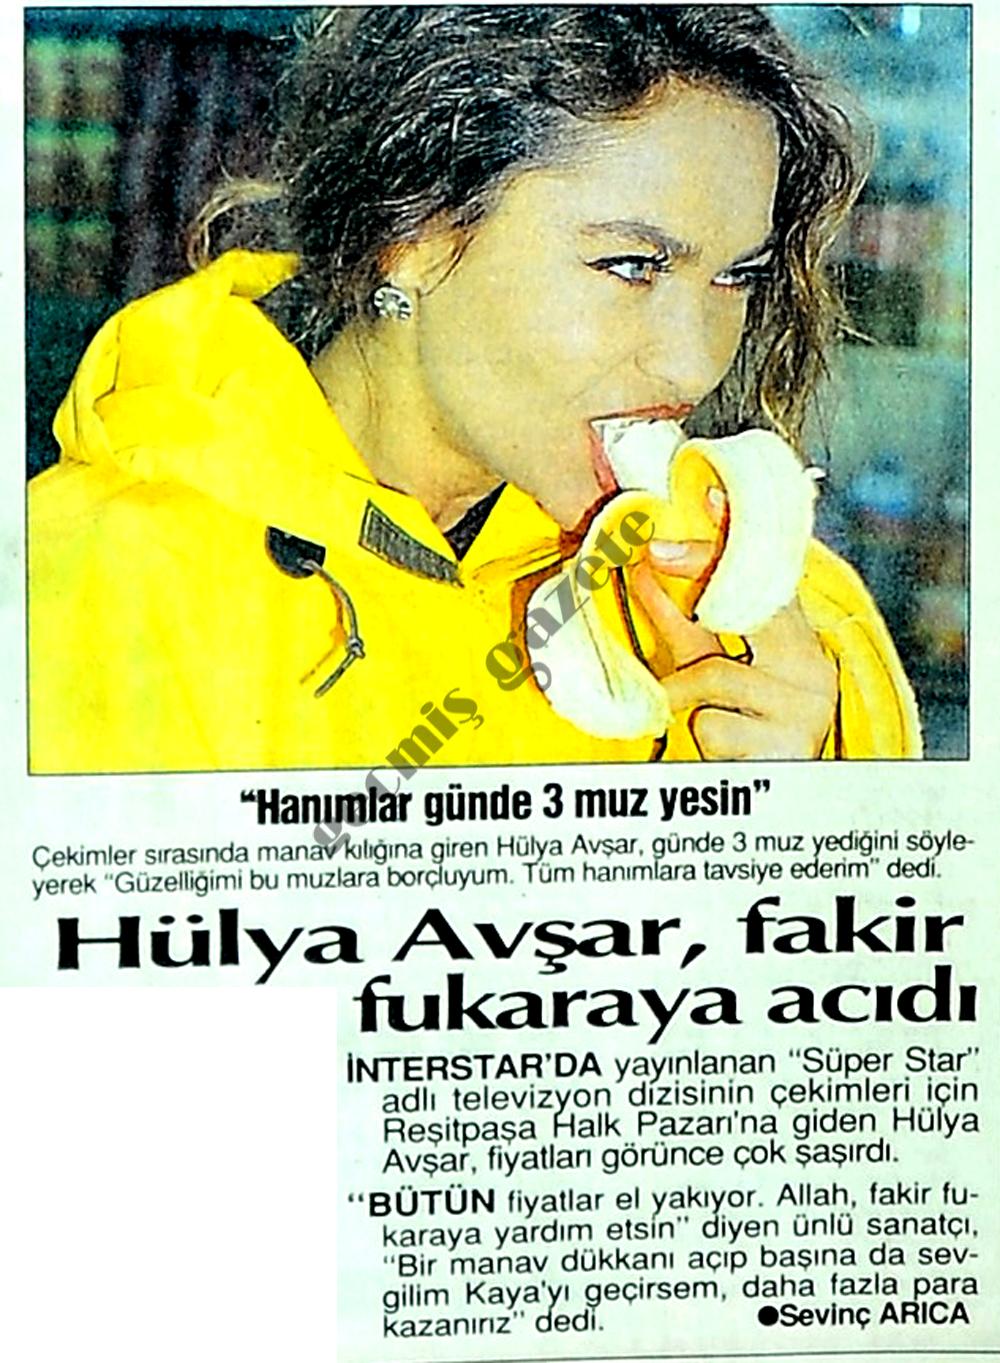 Hülya Avşar, fakir fukaraya acıdı